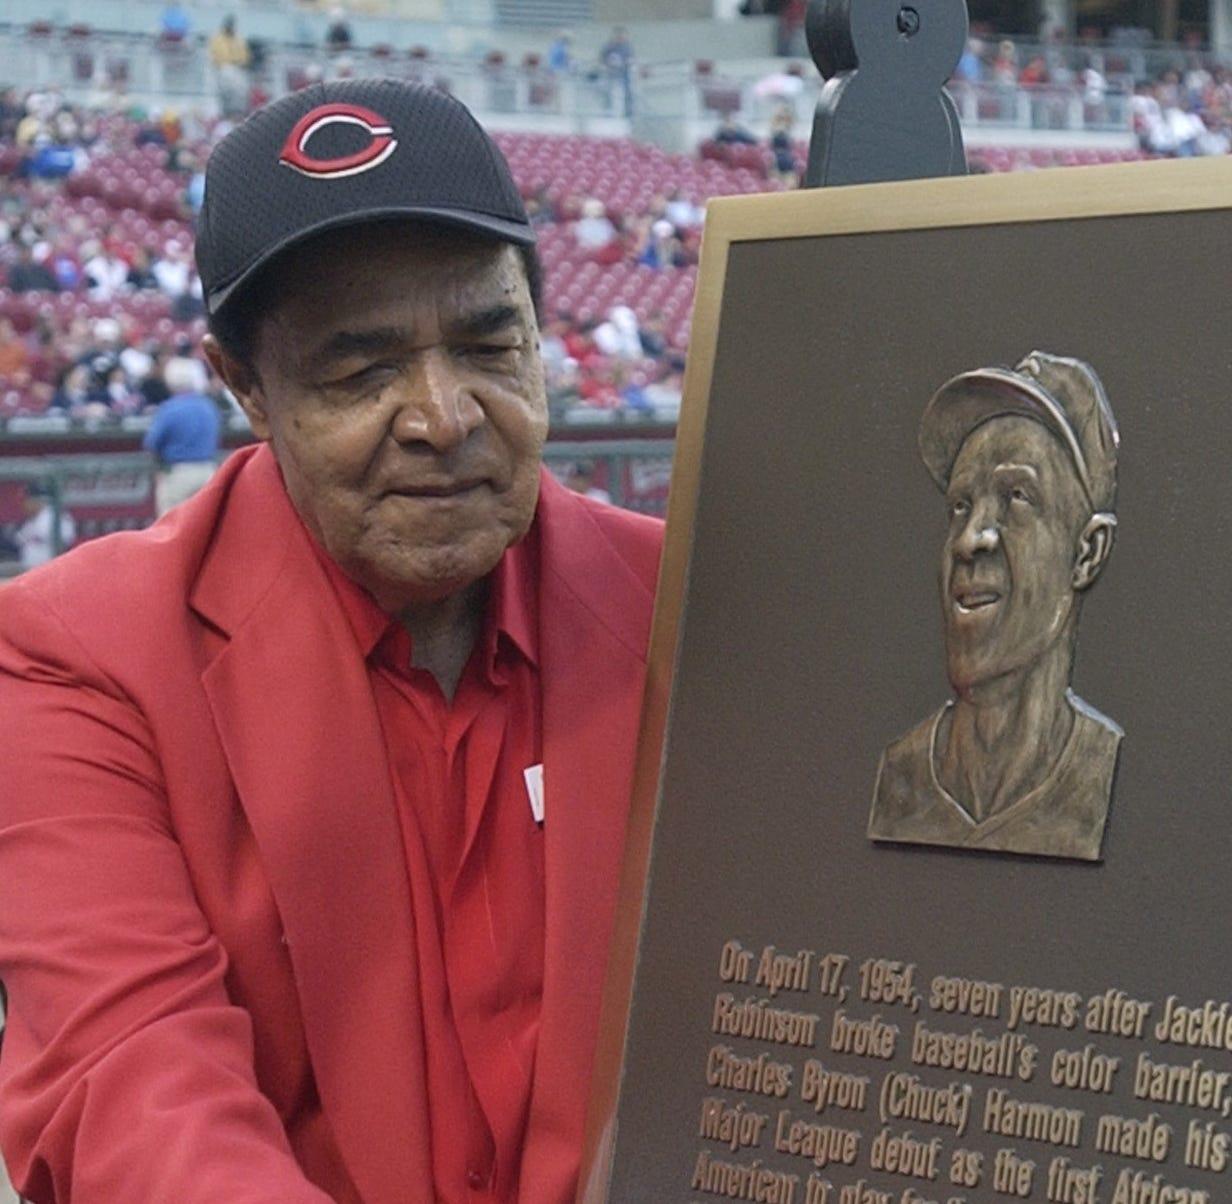 Chuck Harmon, baseball, 1924-2019